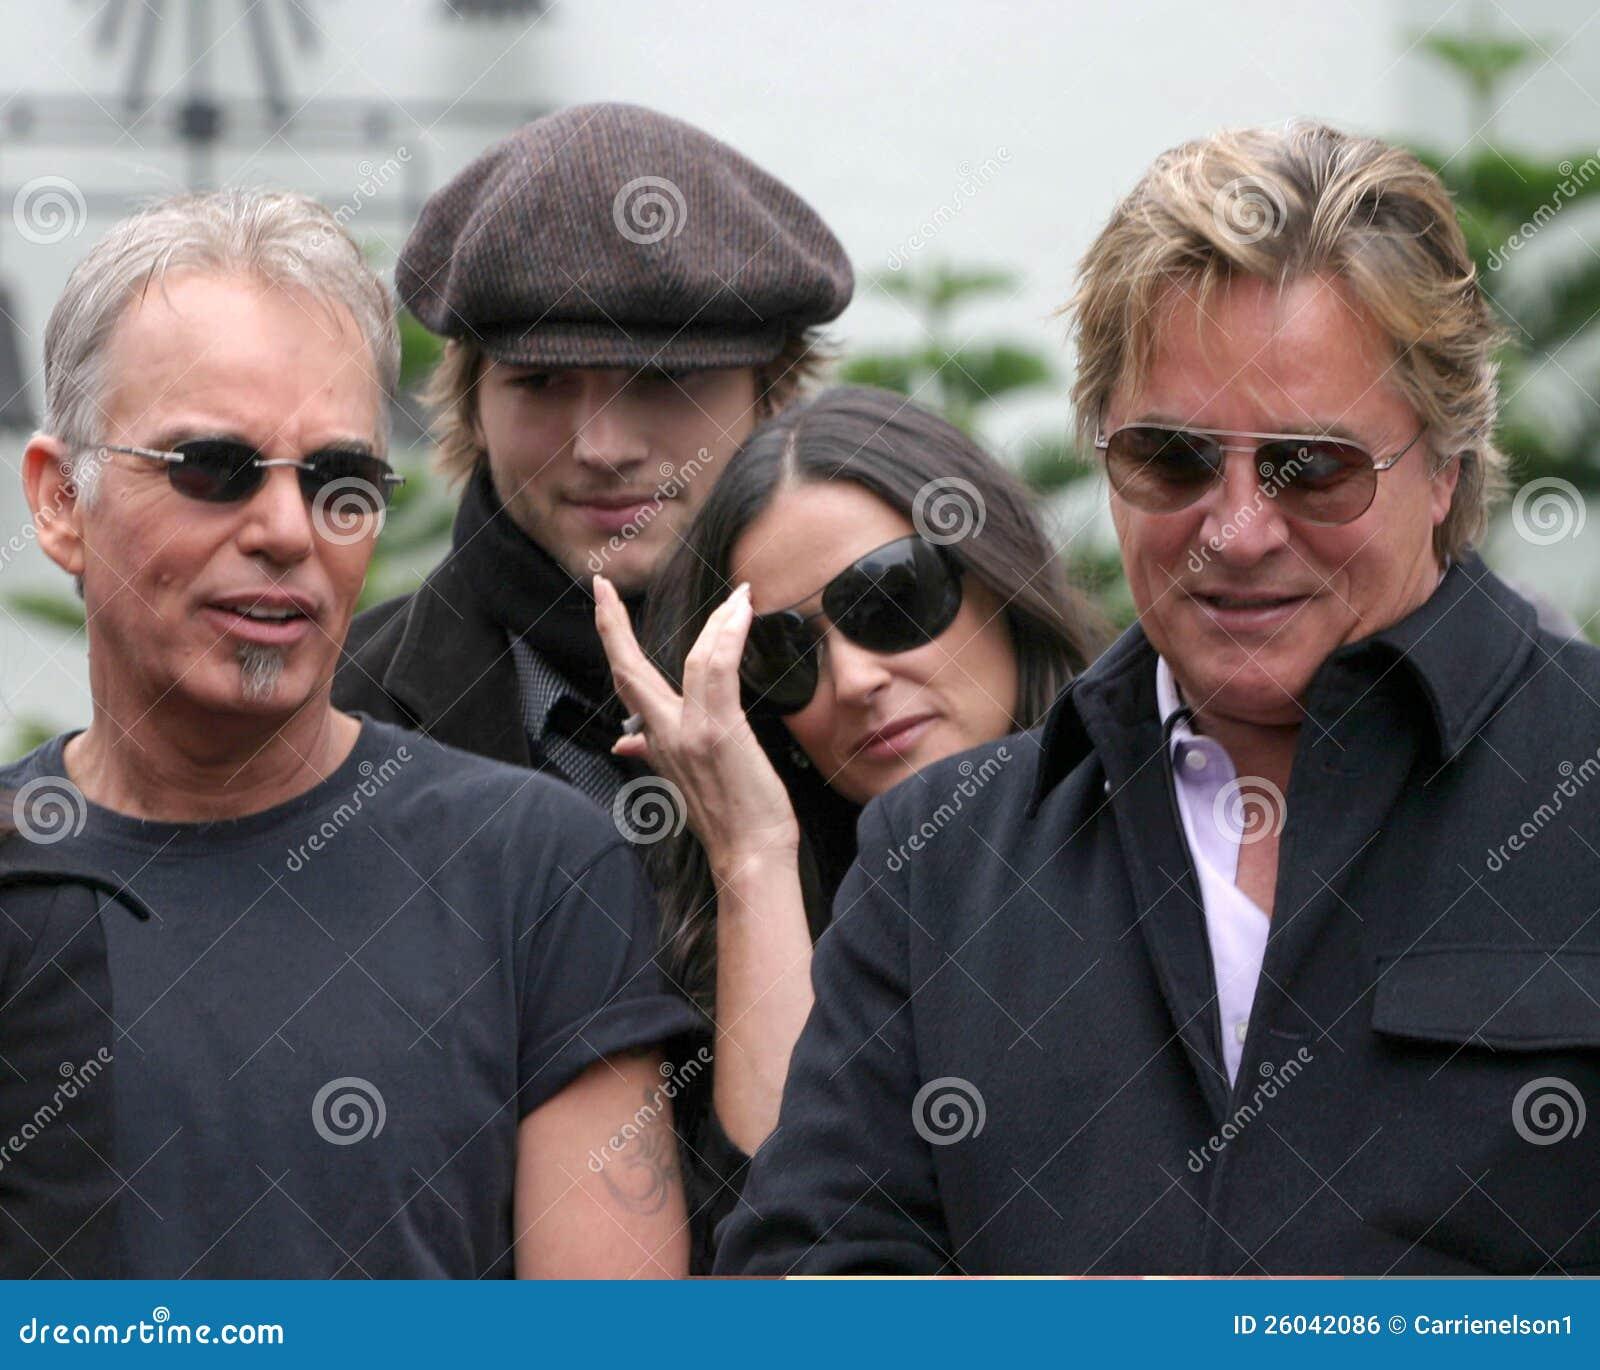 Demi Moore, Don Johnson, Ashton Kutcher, Billy Bob Thornton, PLOMBS Thornton, Bruce Willis de Billy